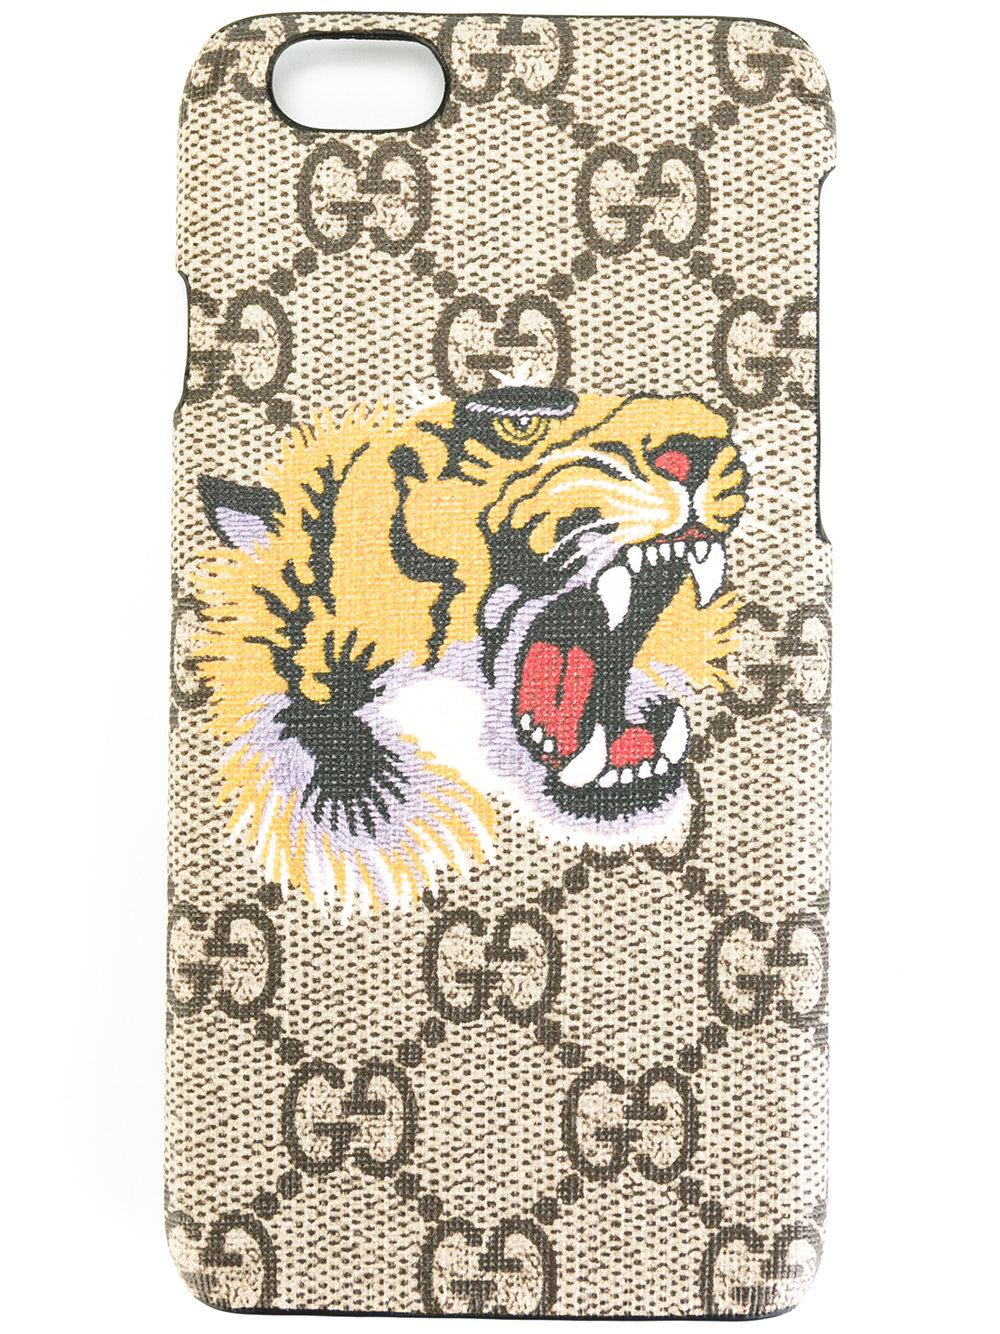 Gucci Tiger Print Gg Supreme Iphone 6/6s Case in Gray